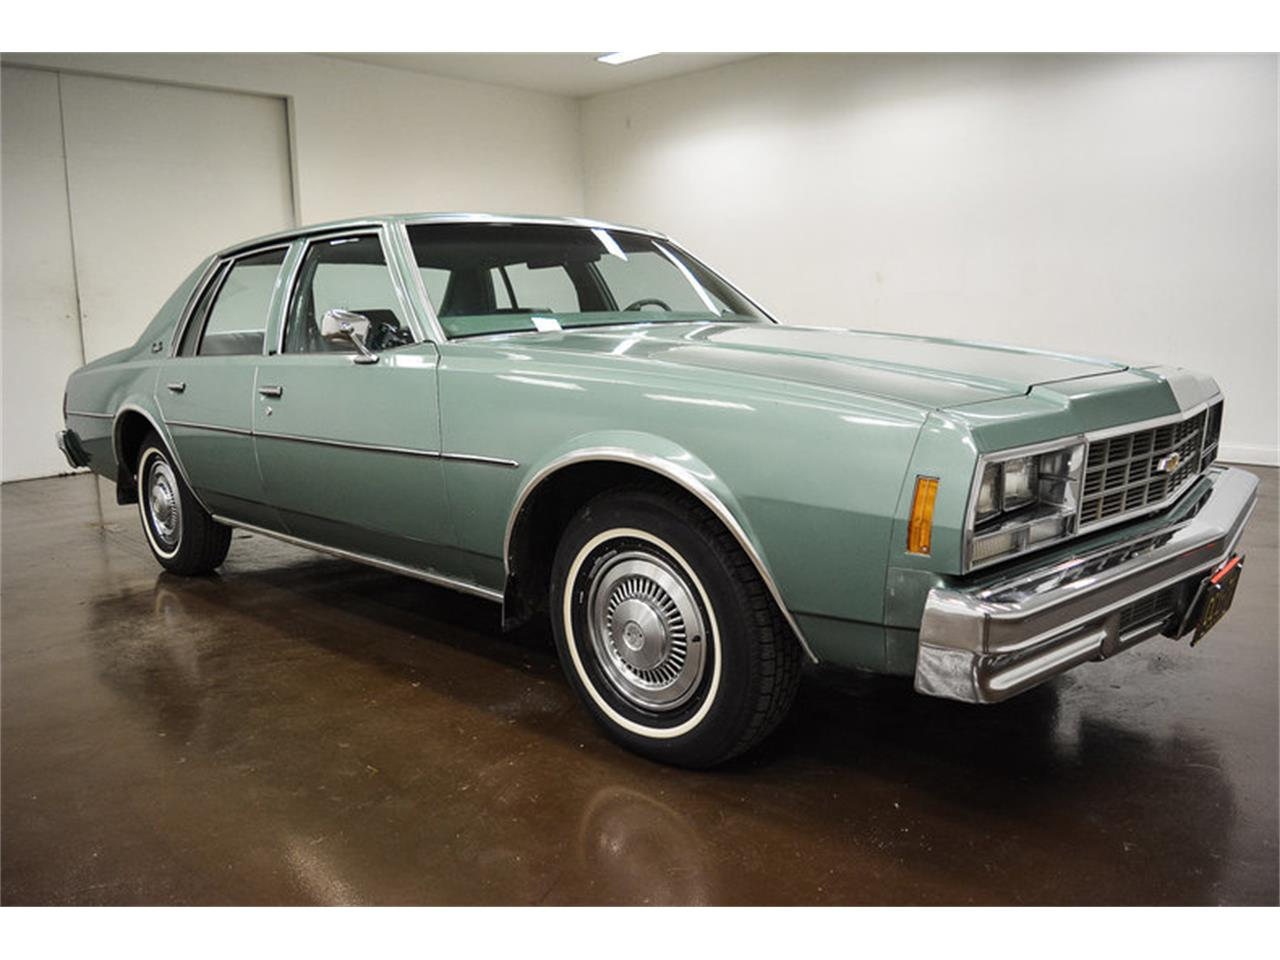 For Sale 1977 Chevrolet Impala In Sherman Texas